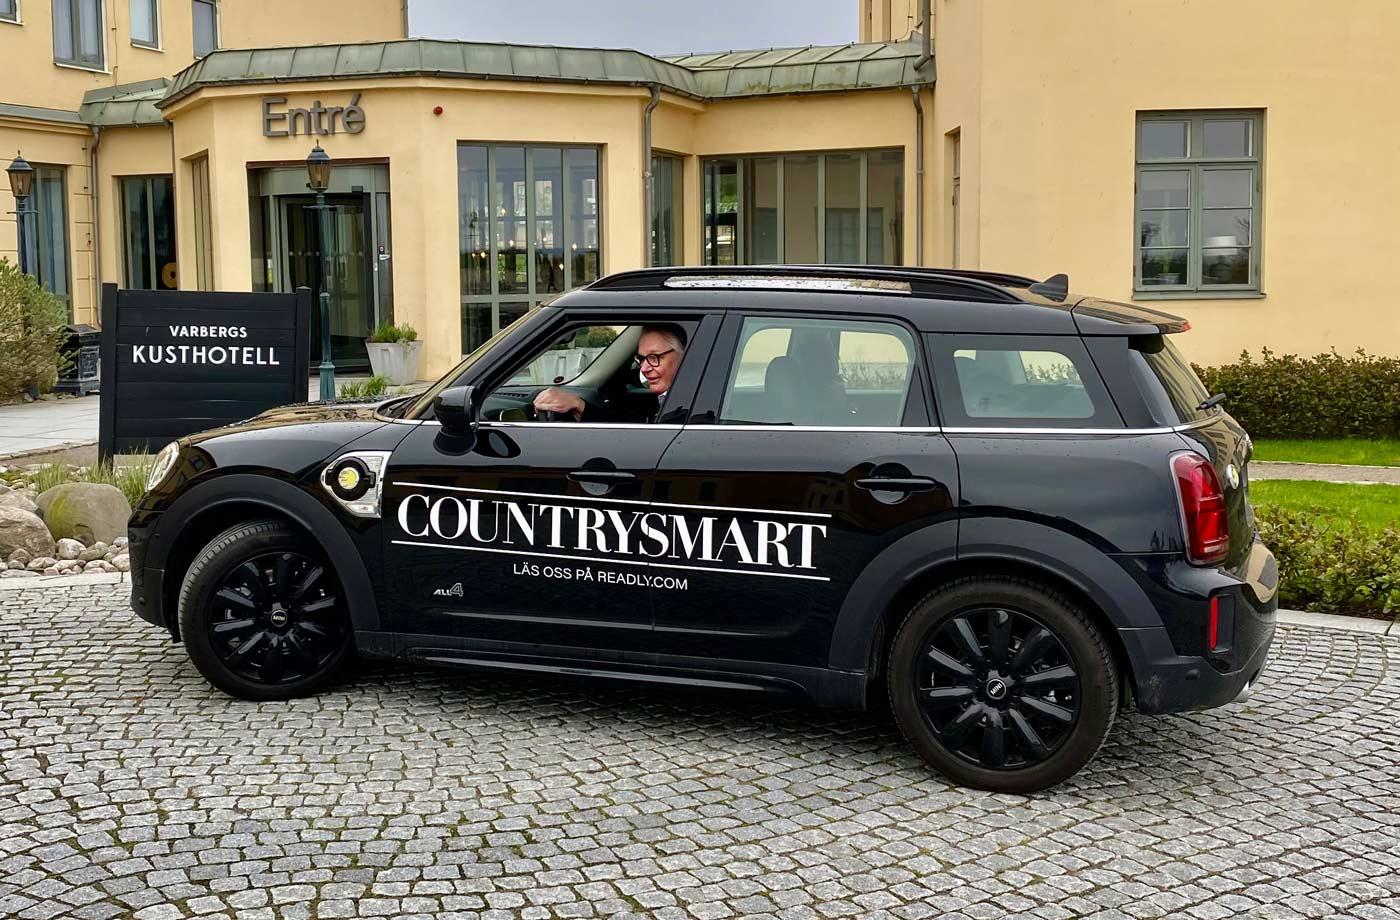 Countrysmart-bilen i Varberg